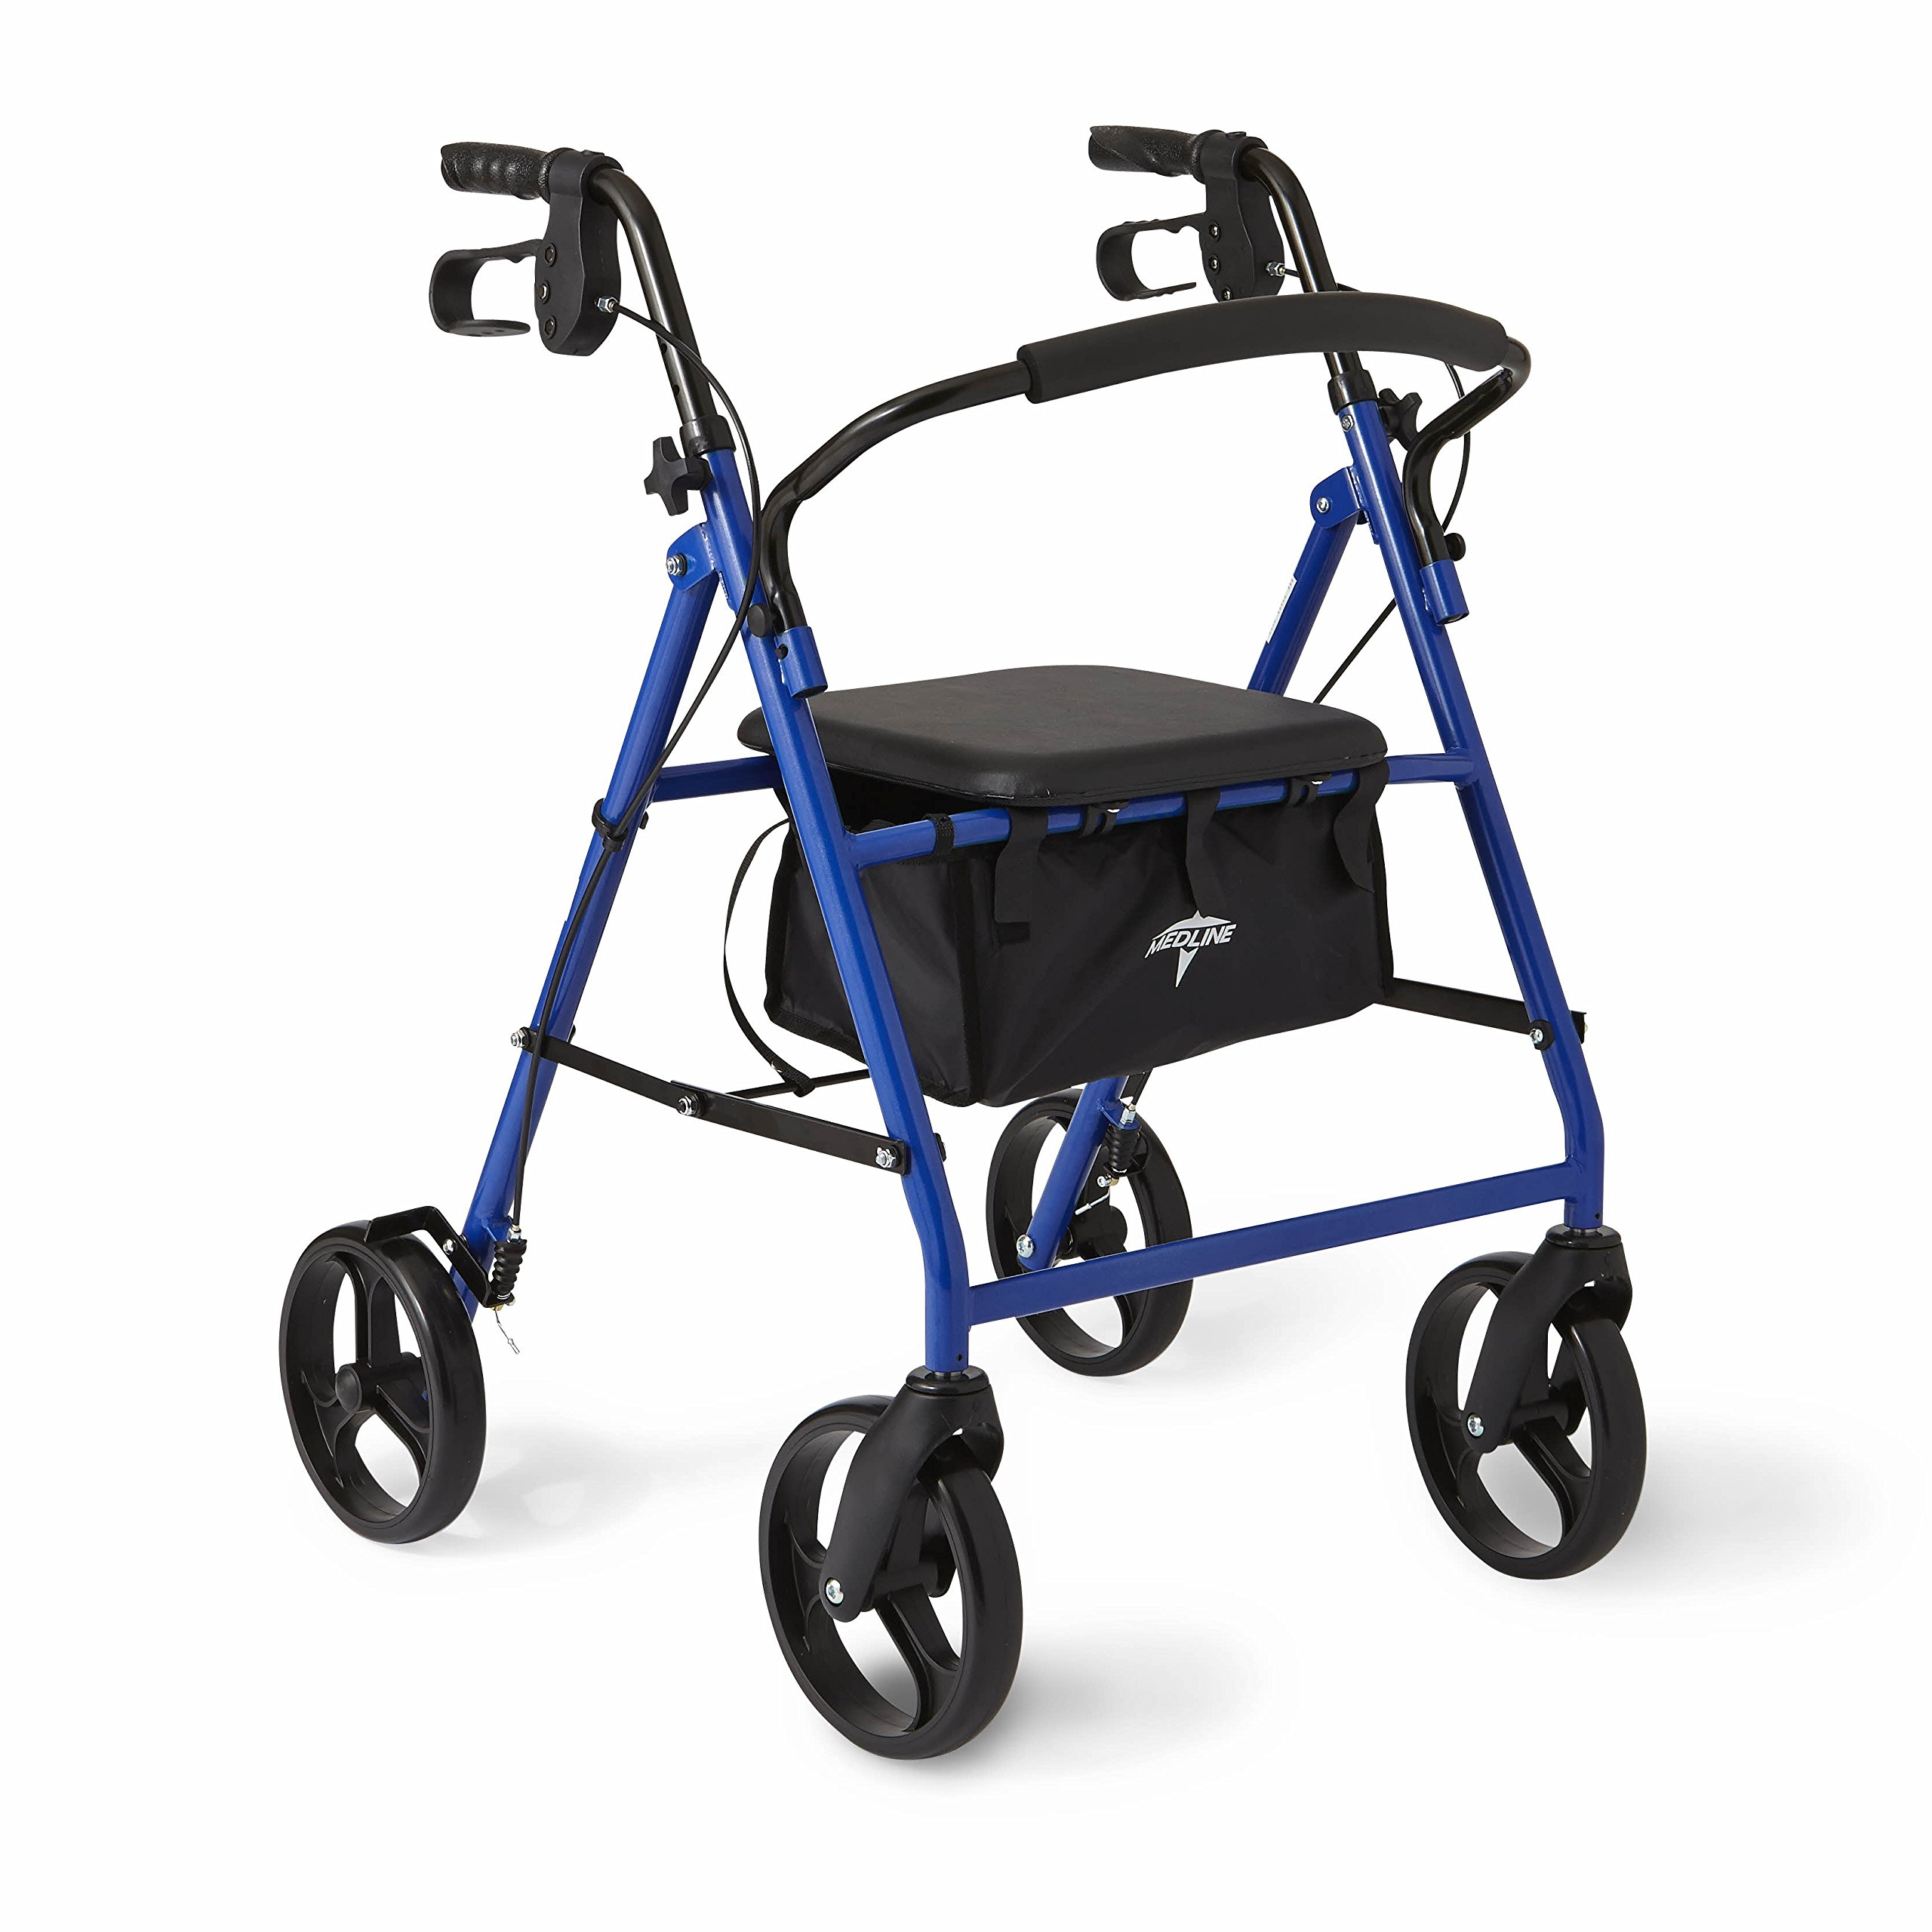 Medline Standard Steel Folding Rollator Adult Walker with 8'' Wheels, Blue by Medline